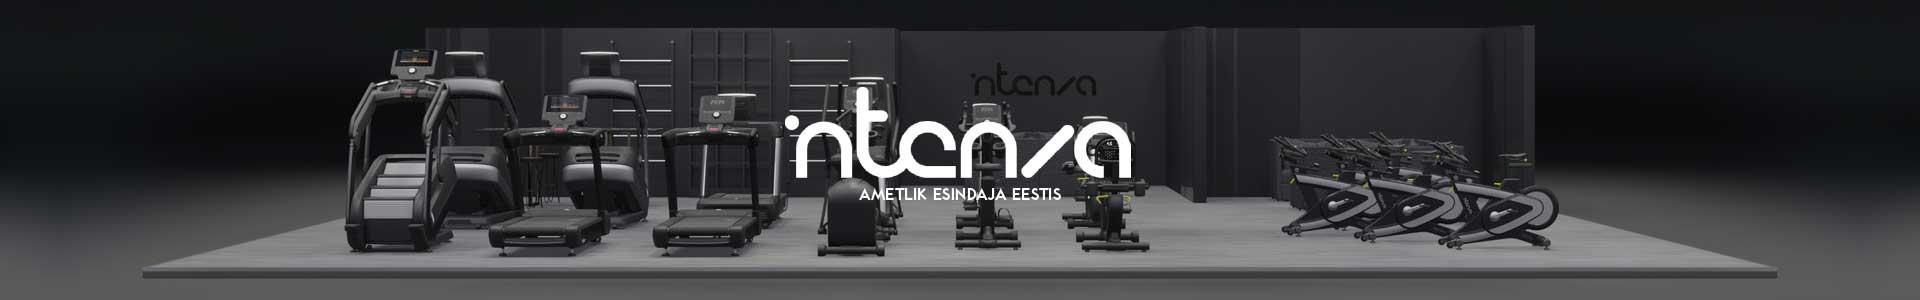 Budopunkt – Intenza Fitness Eesti